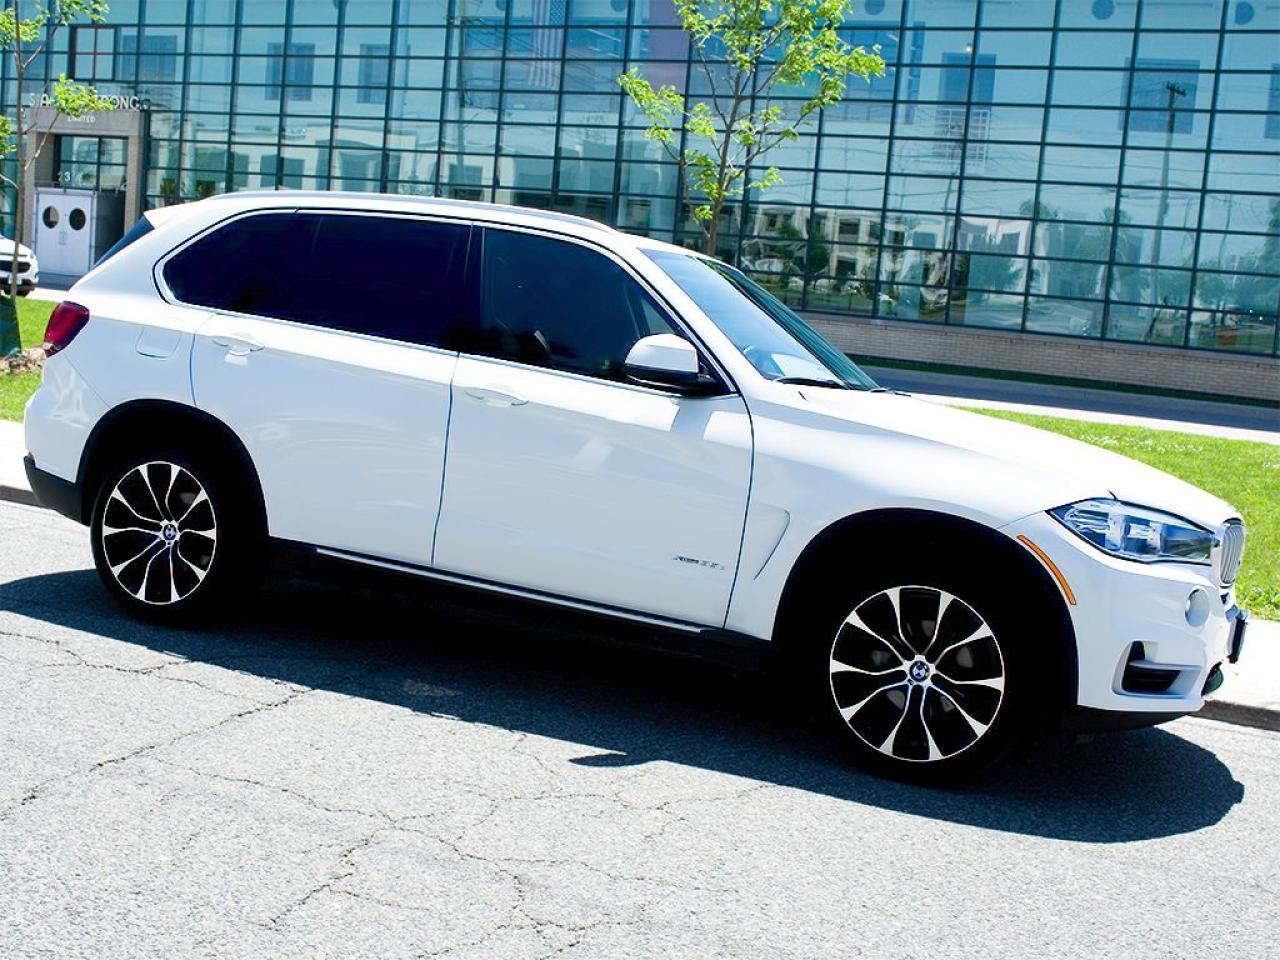 2014 BMW X5 35D|7 SEATS|NAVI|360 CAM|DUAL DVD|HEADS UP DISPL|R